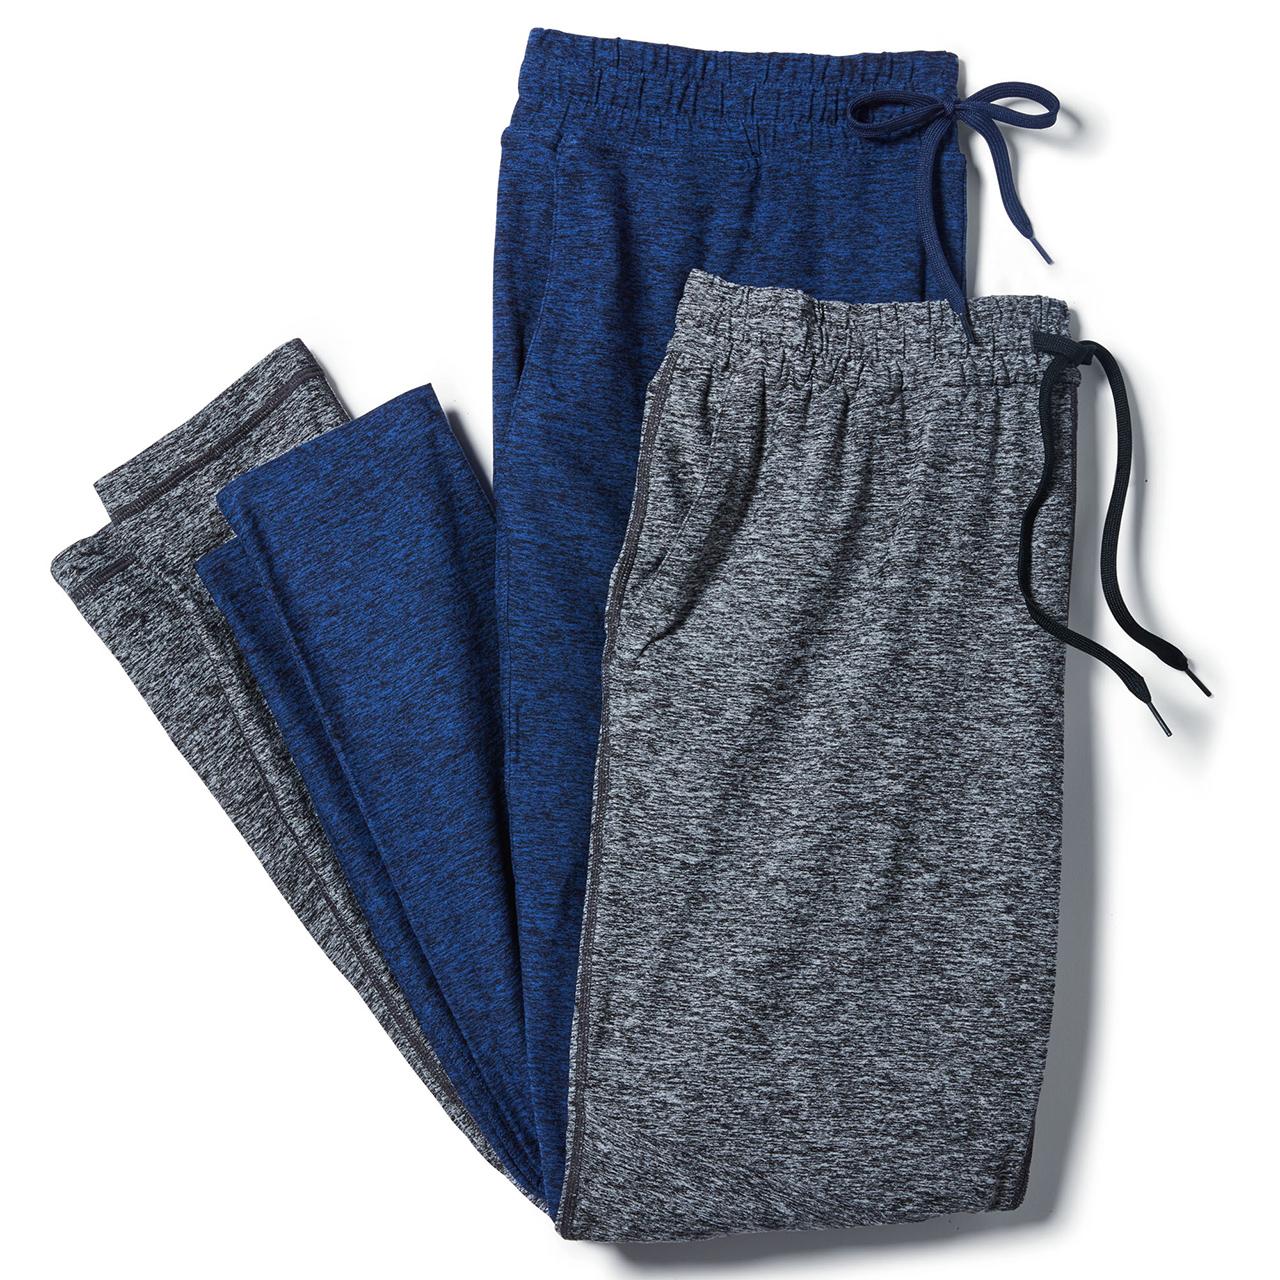 CloudKnit Sweatpants